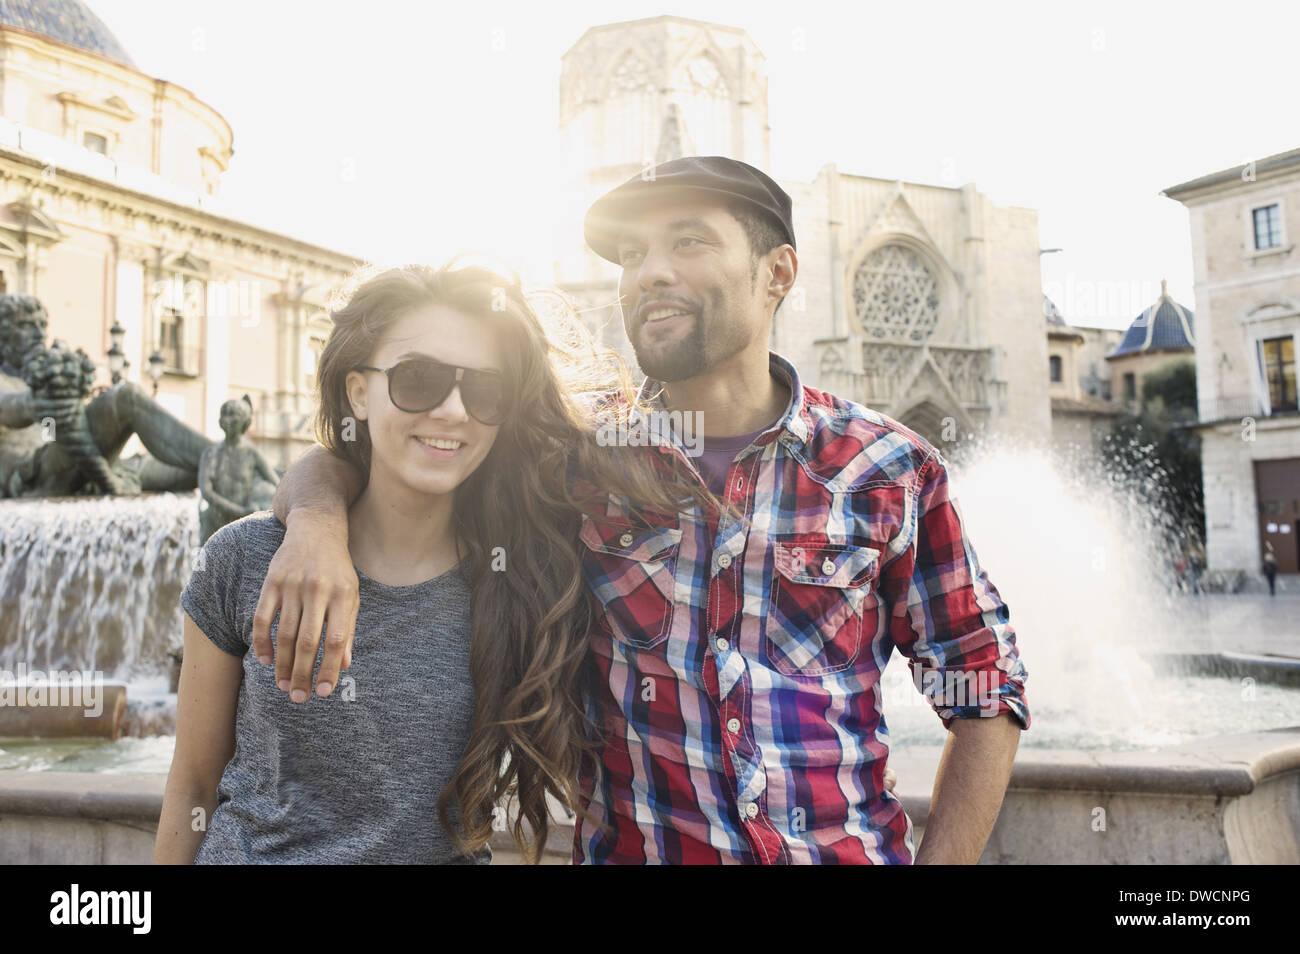 Tourist couple posing, Plaza de la Virgen, Valencia, Spain Stock Photo